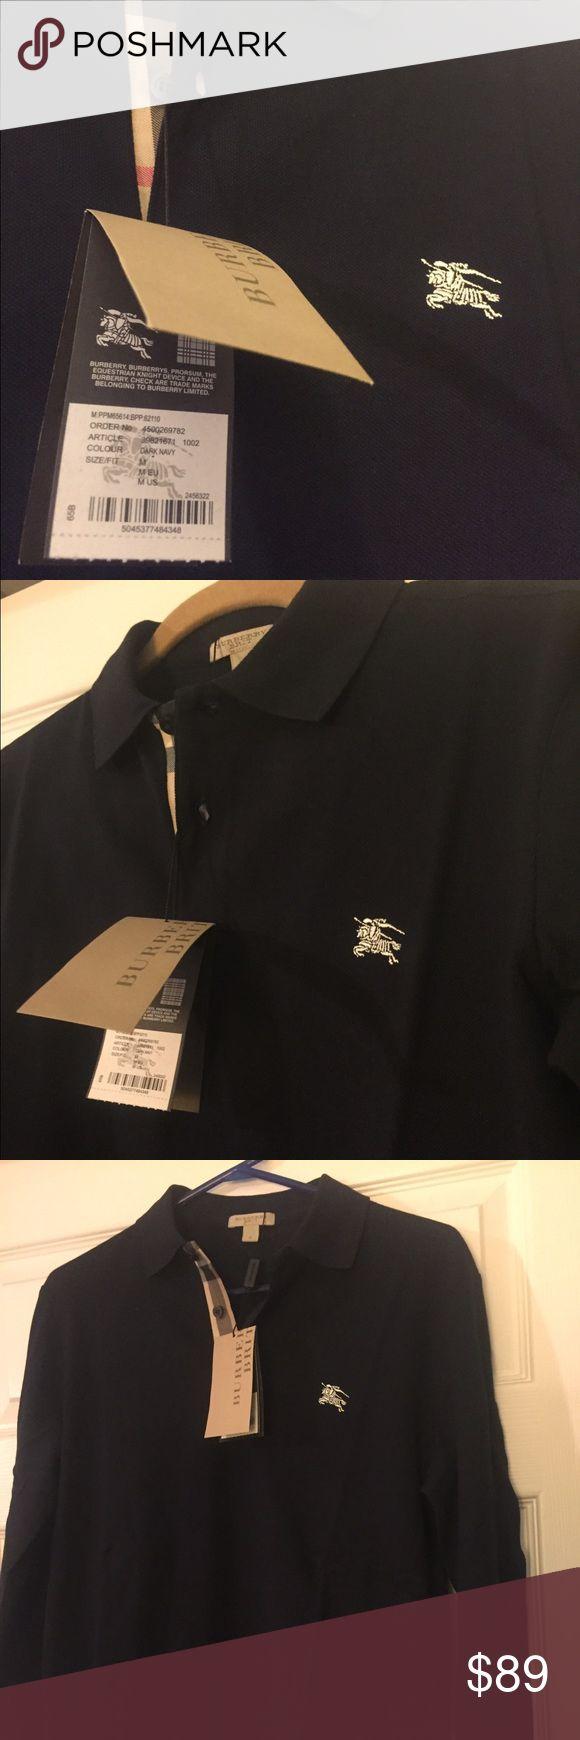 NWT Authentic Men's Burberry Long Sleeve Shirt 🔥🔥🔥Brand New Burberry Men's Shirt in Dark Navy Size Medium🔥🔥🔥 Burberry Shirts Polos